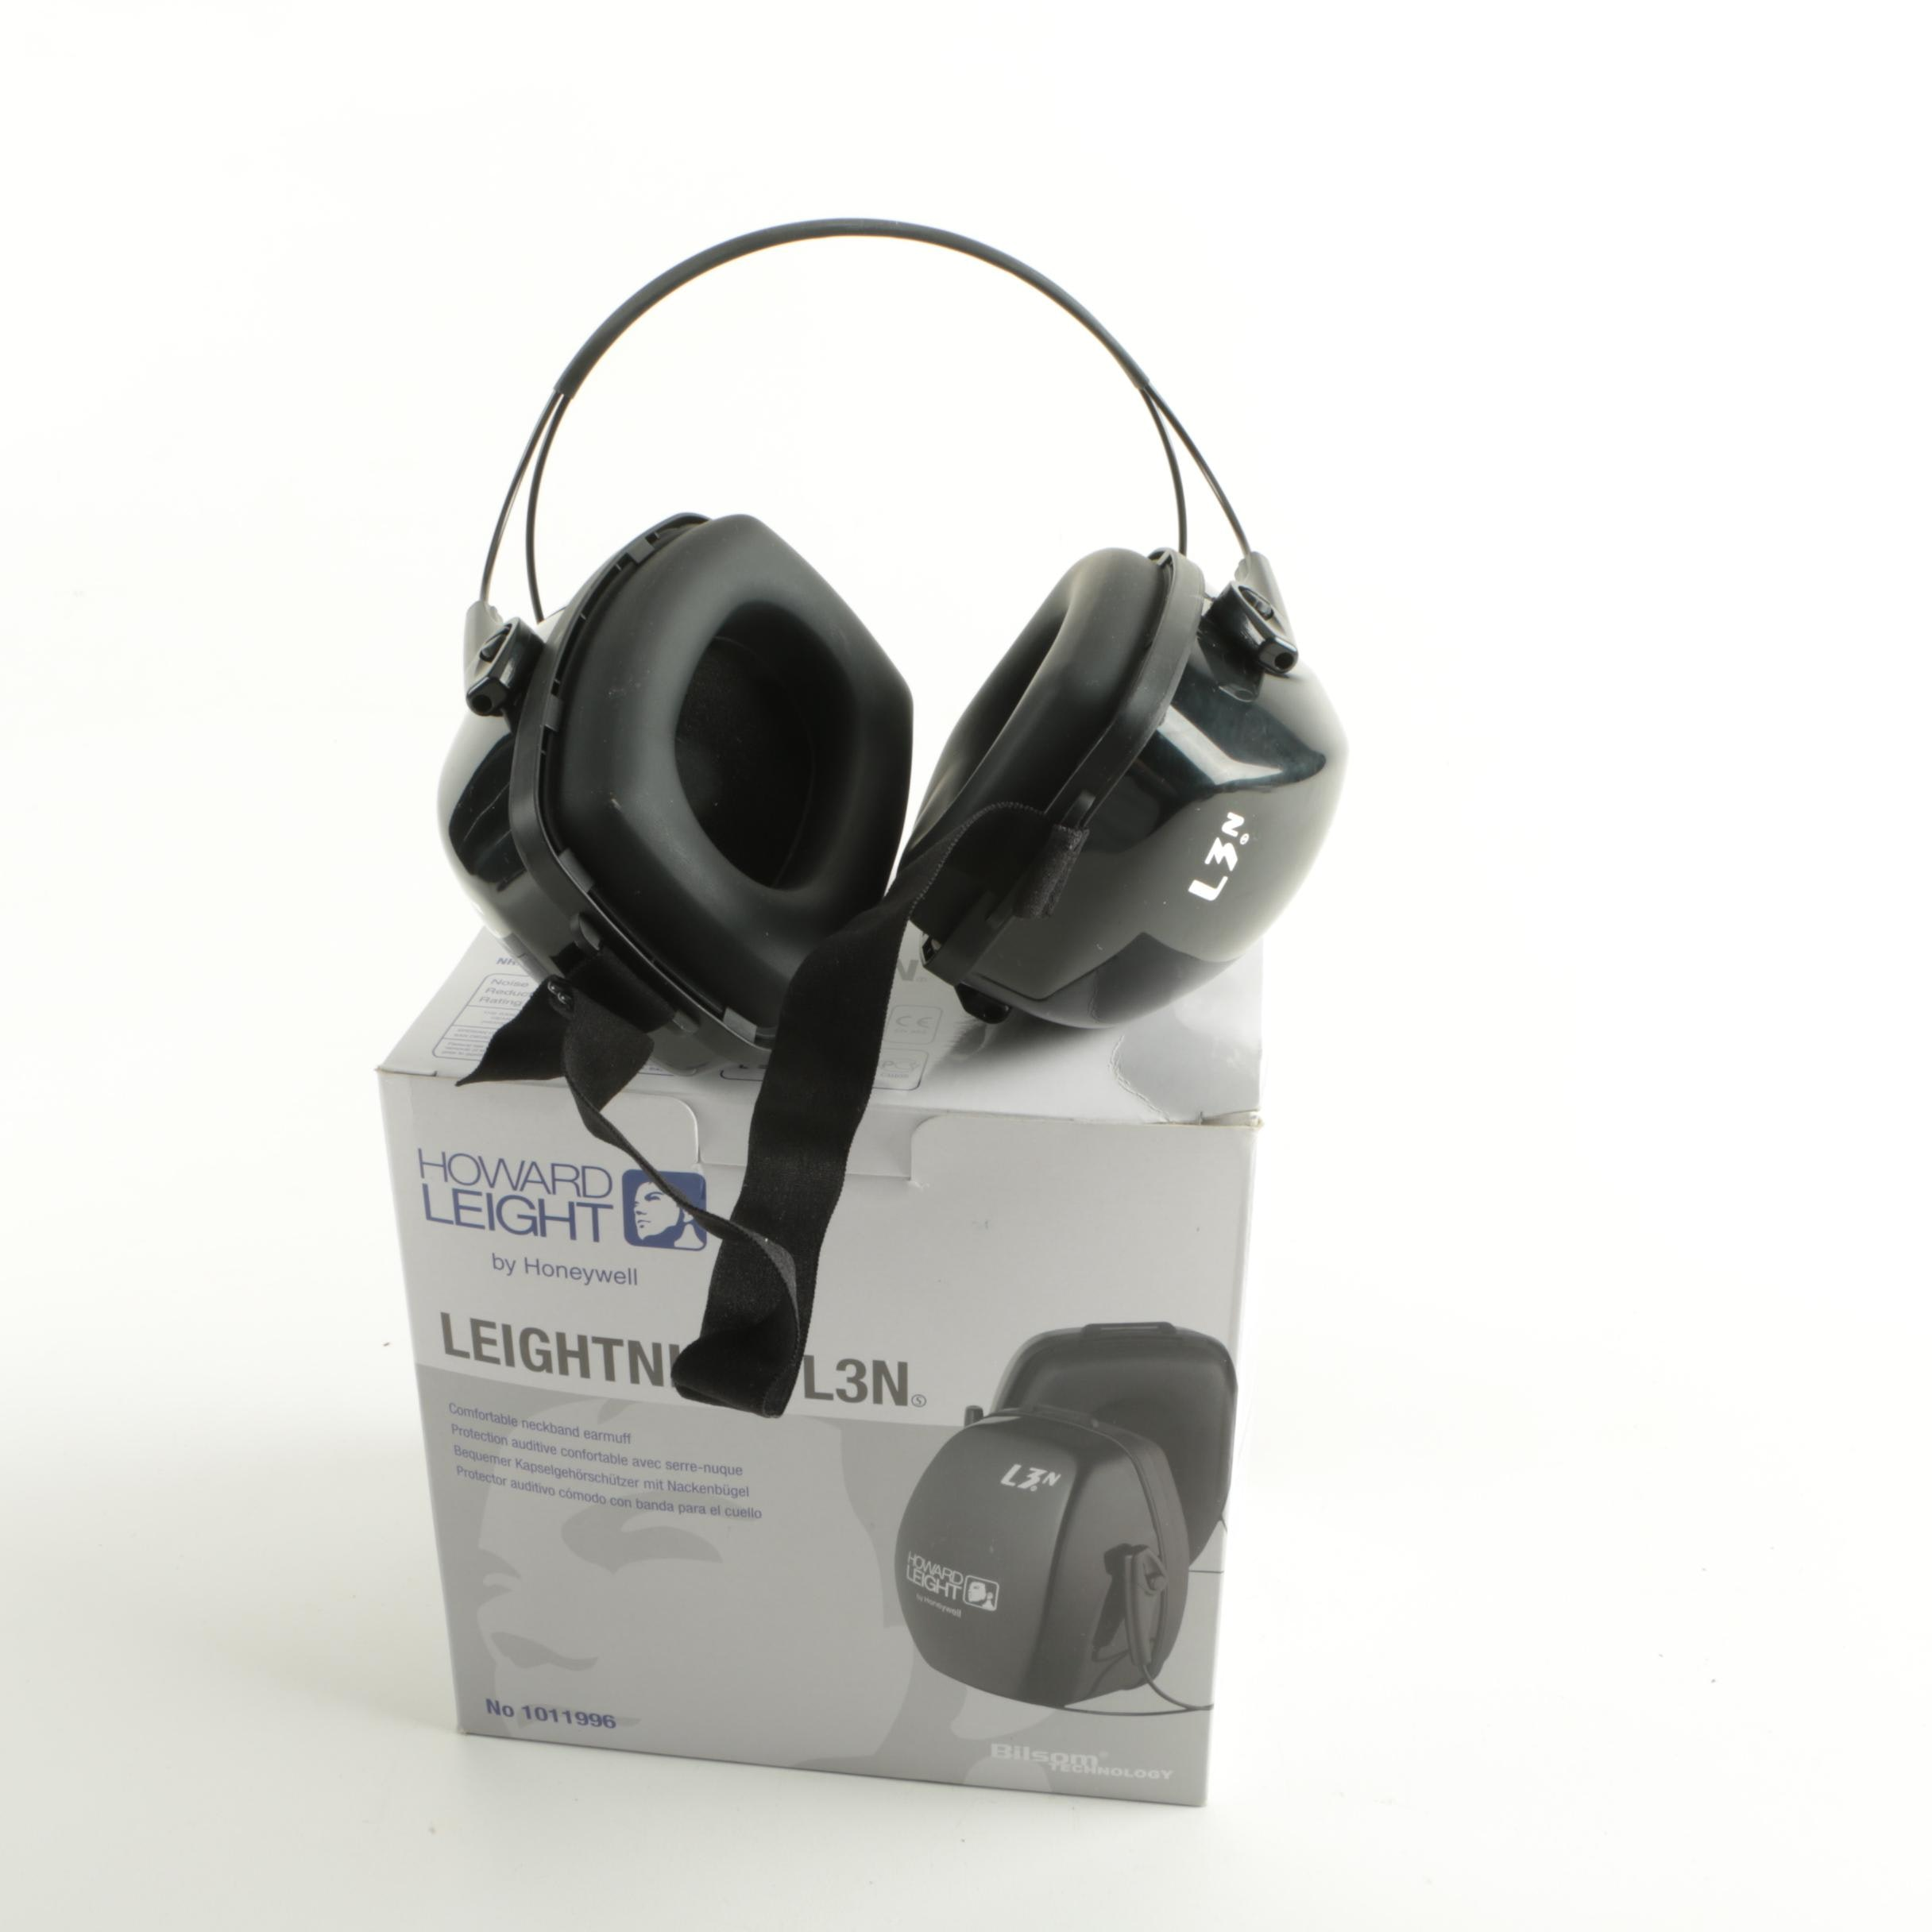 Howard Leight Leightning L3N Ear Muffs